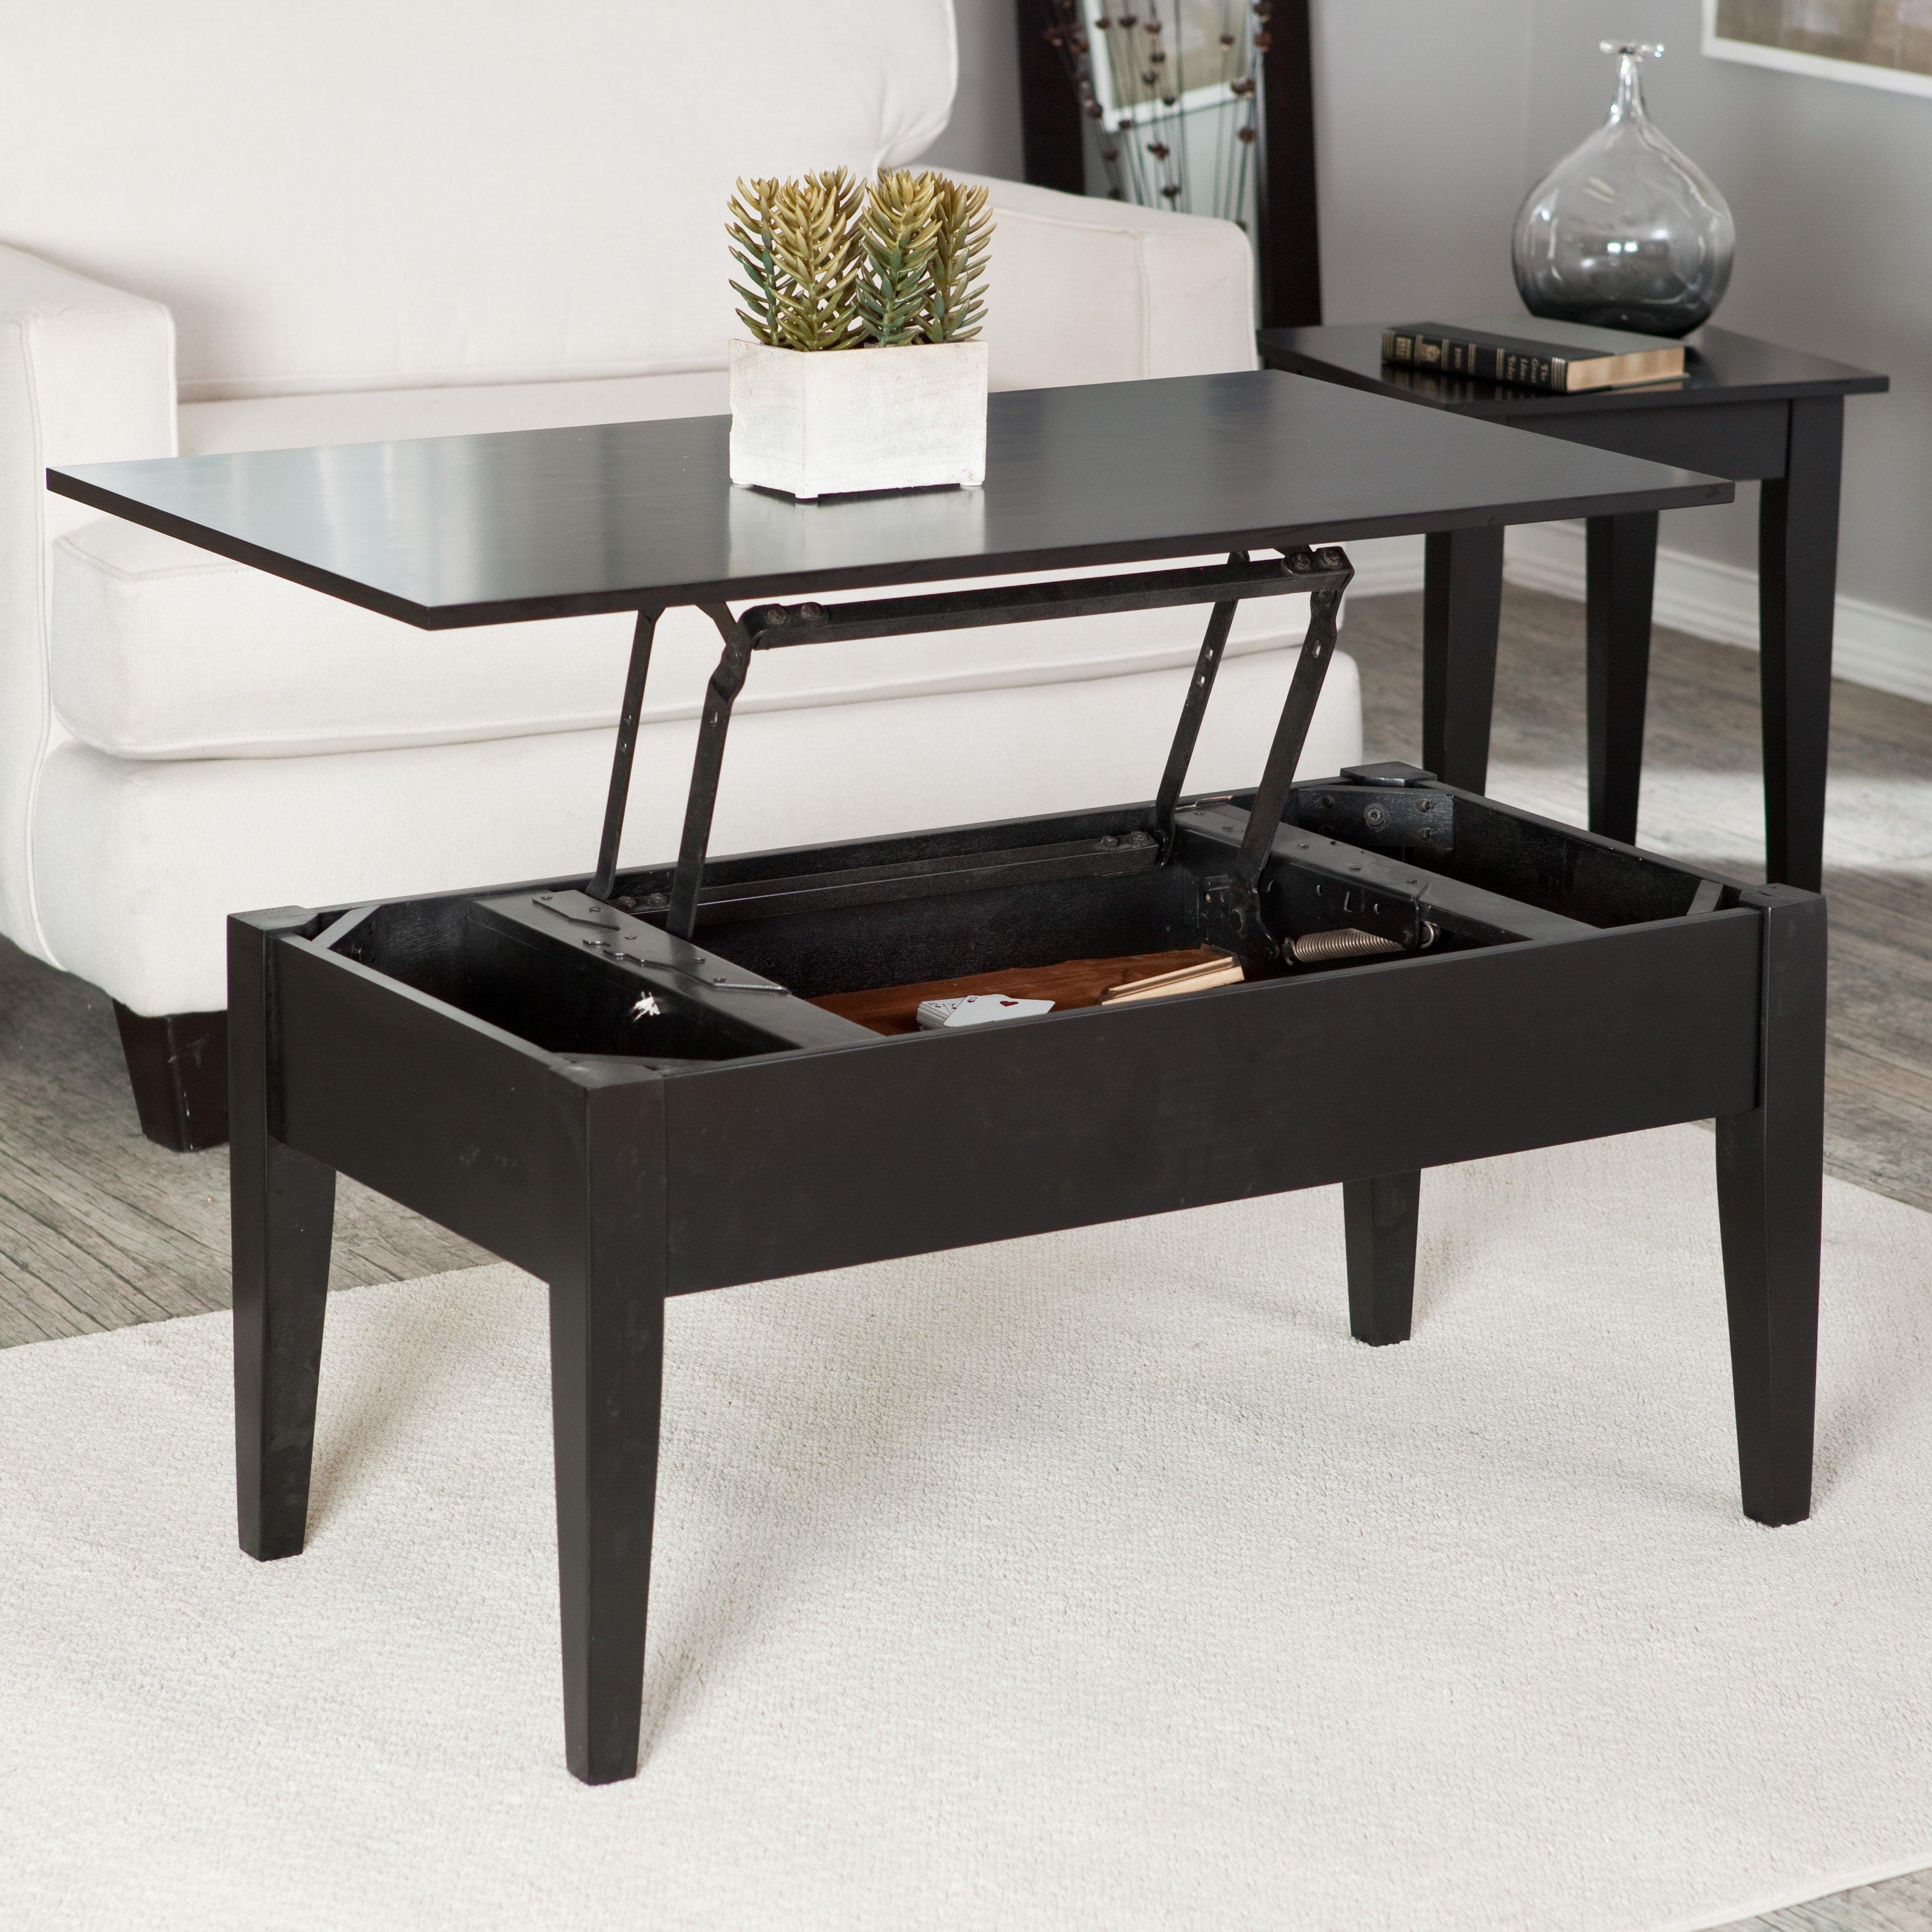 turner lift top coffee table - espresso | hayneedle QZBCLIL